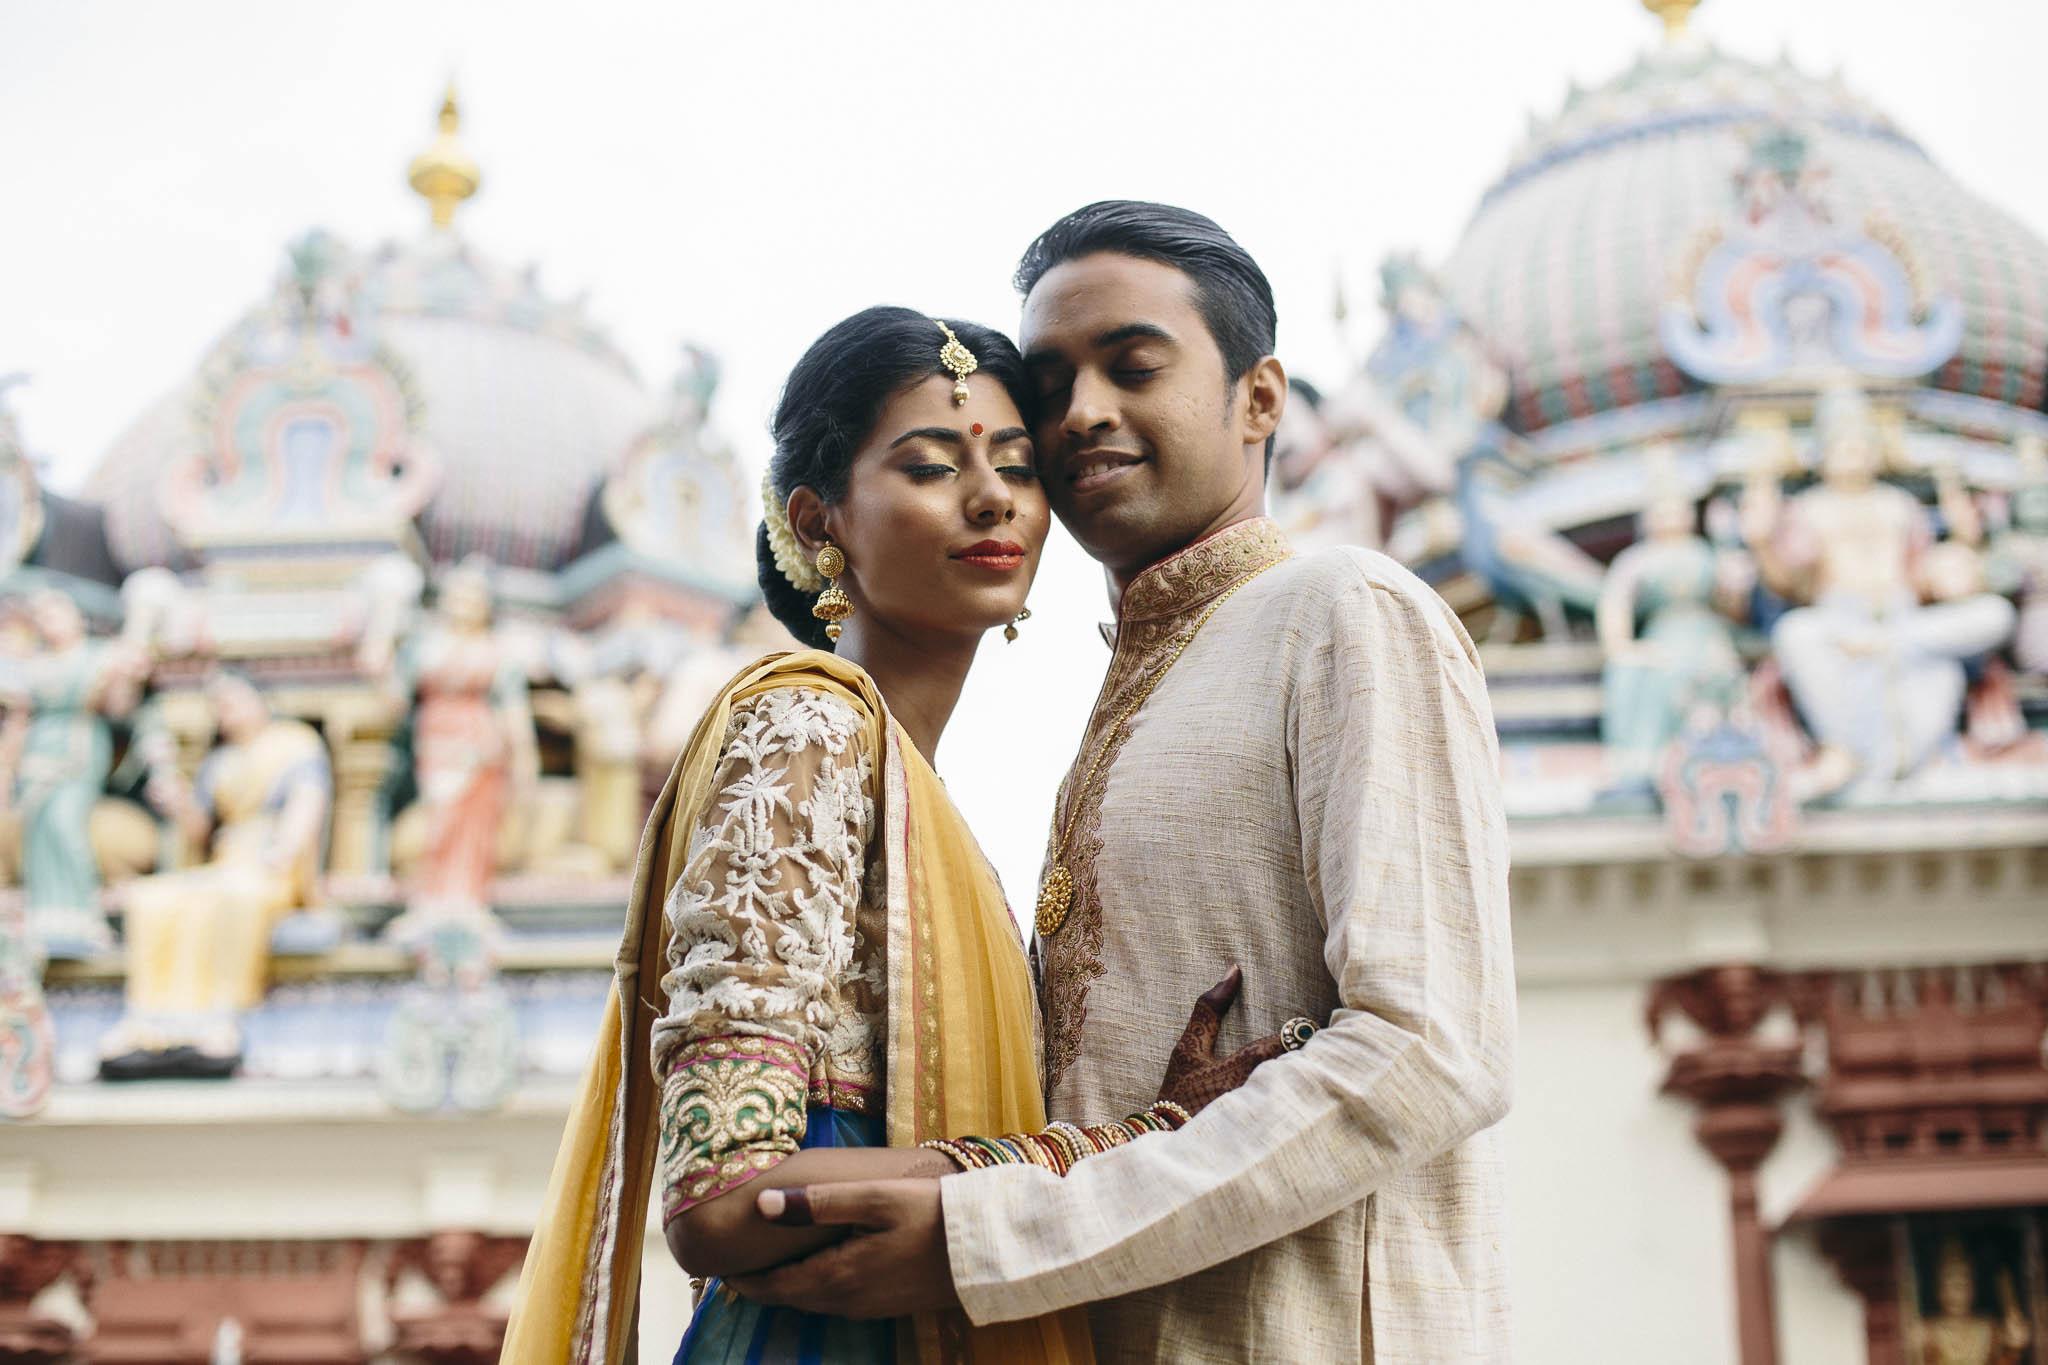 singapore-wedding-photographer-malay-indian-pre-wedding-travel-wmt-2015-63.jpg